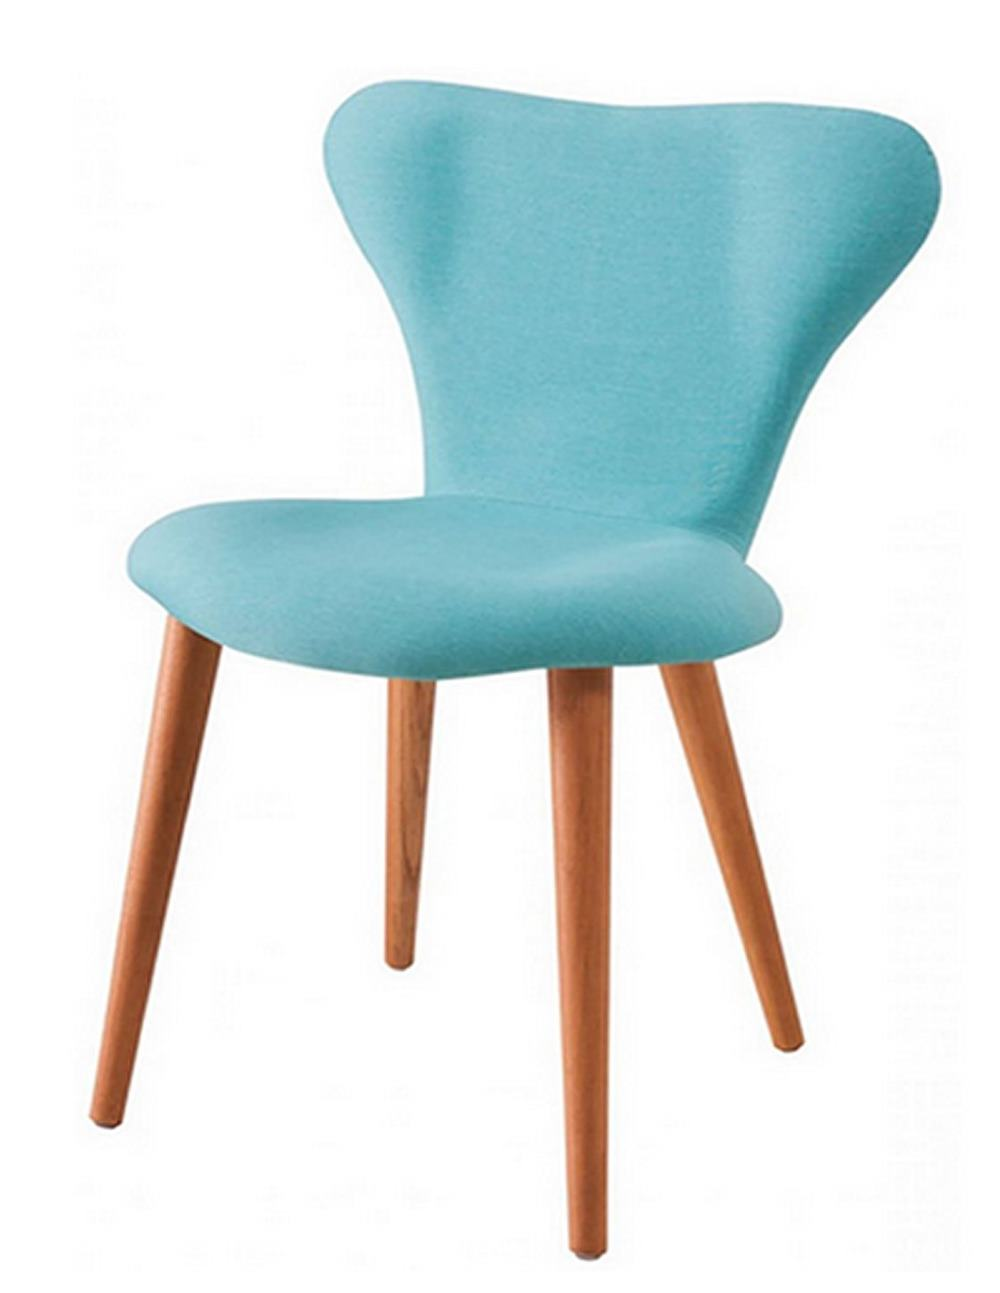 Cadeira Jacobsen Series 7 Azul com Pes Palito Tauari - 49607